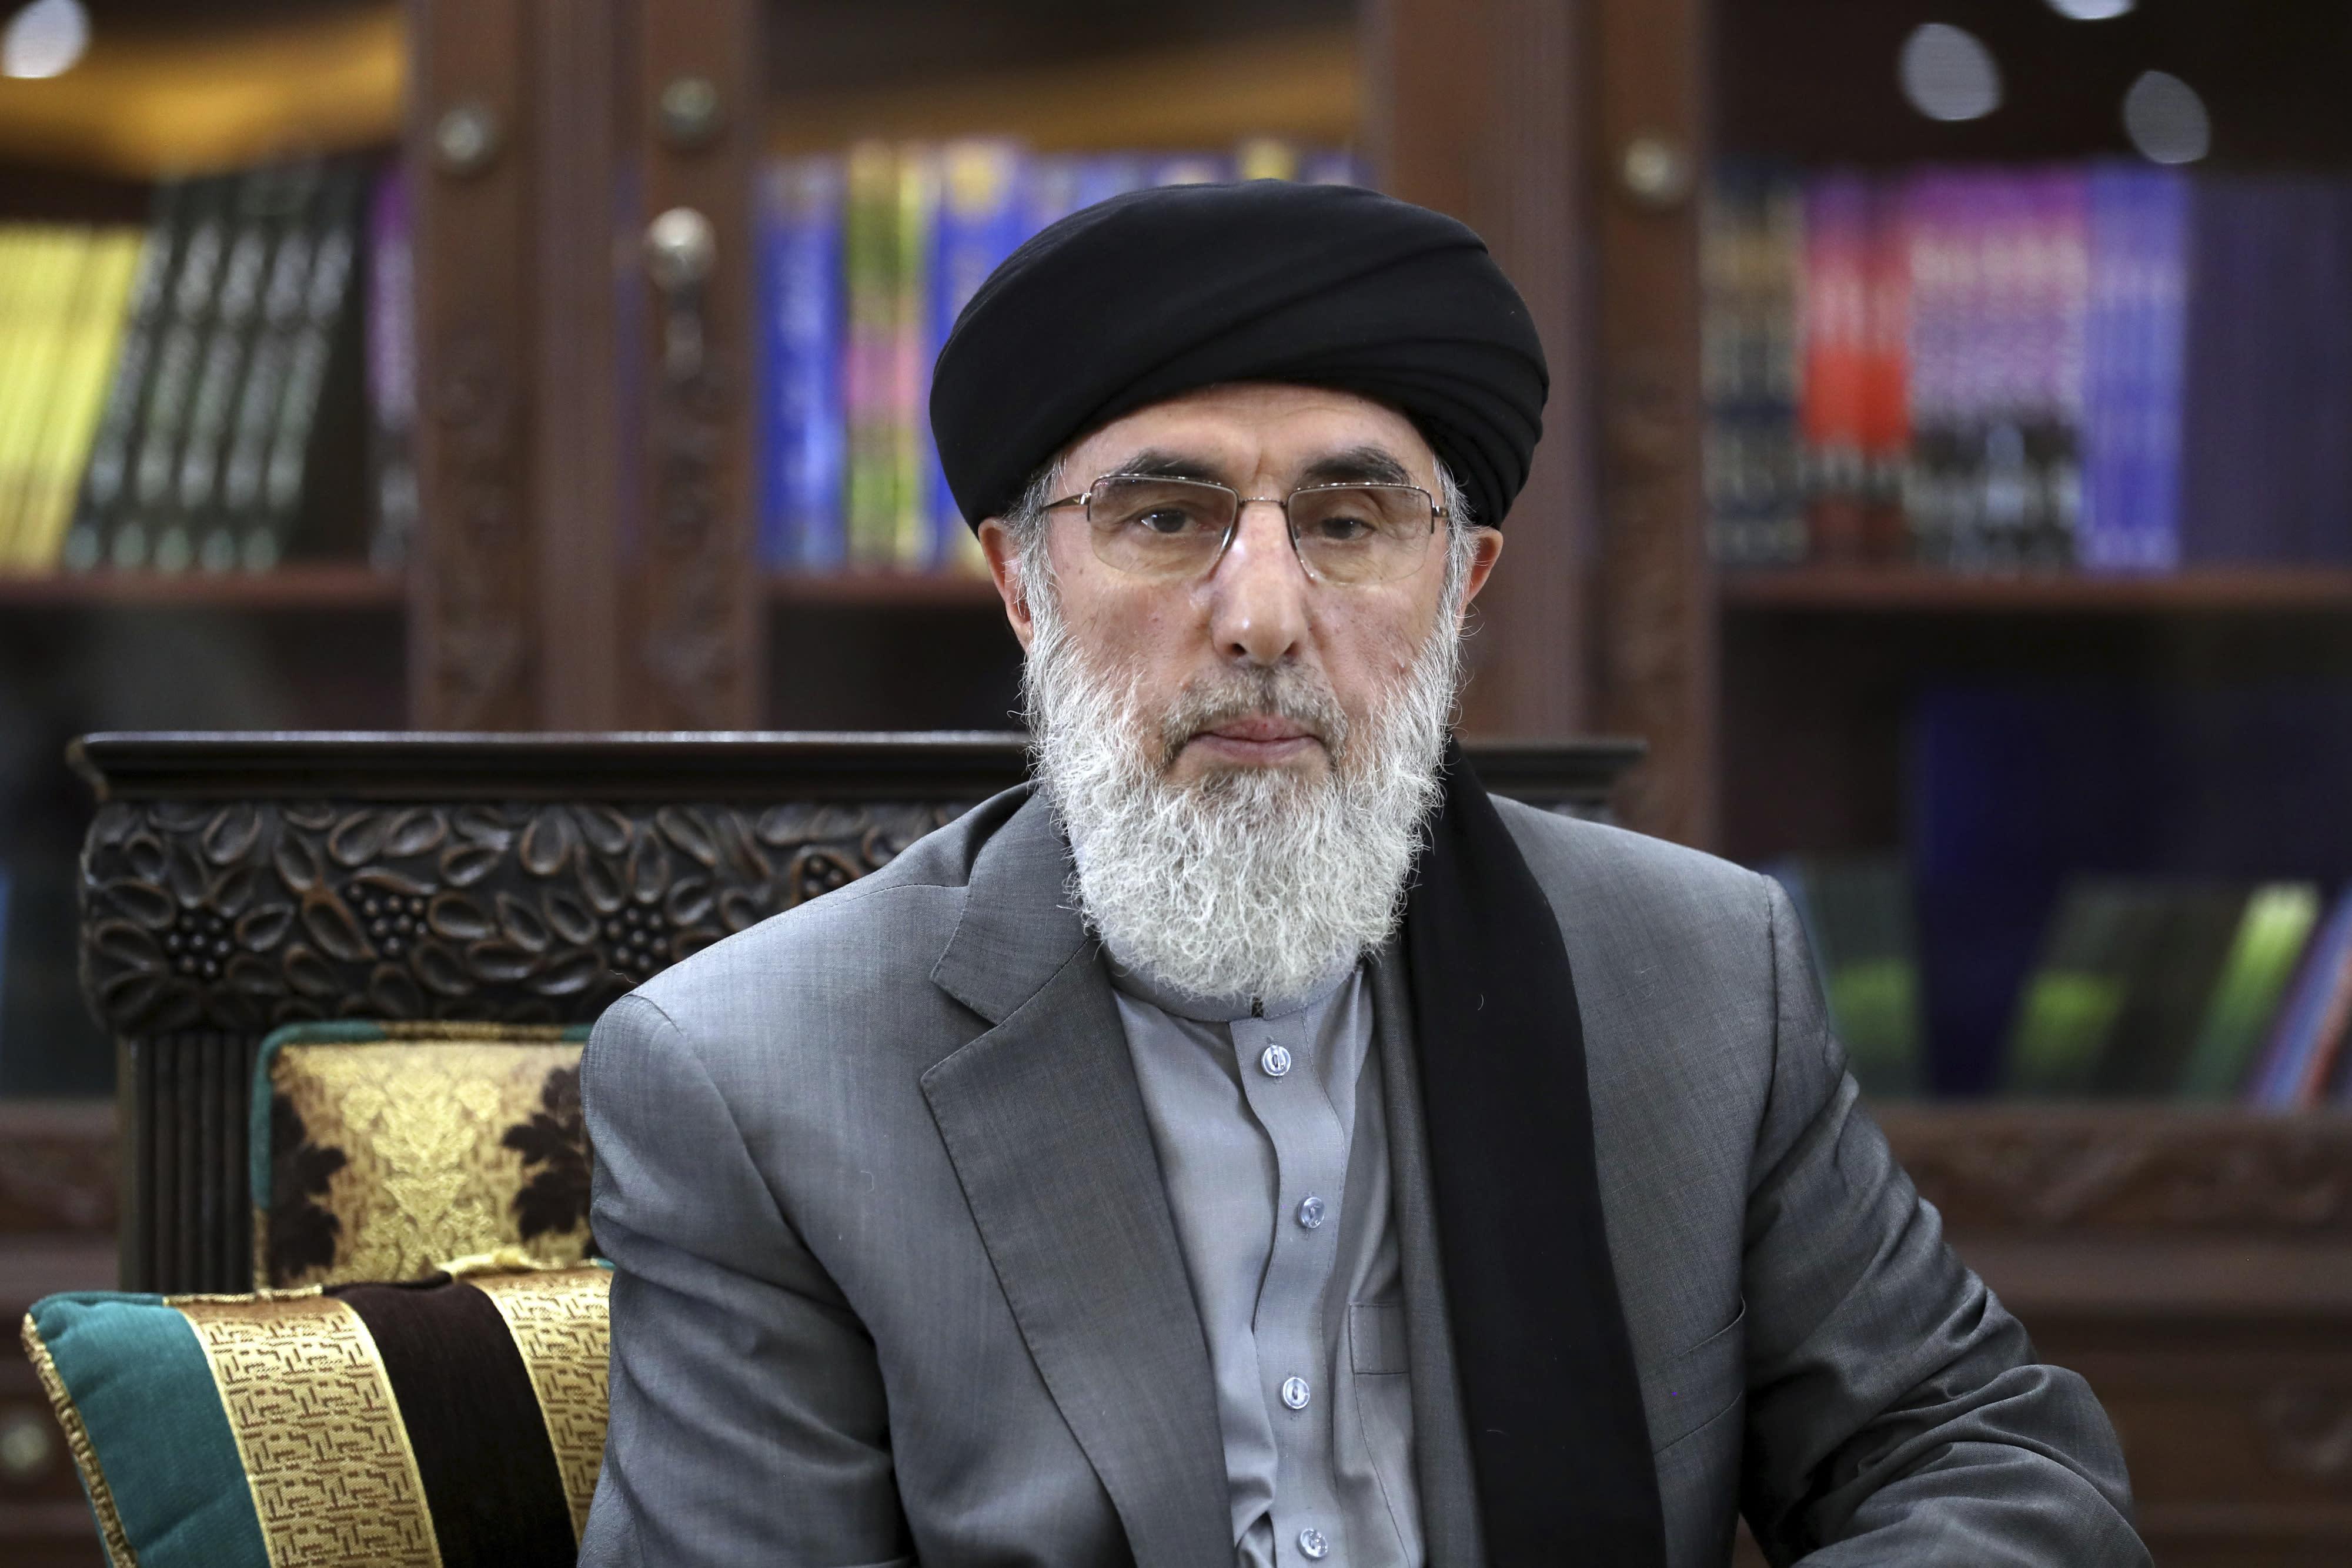 Afghan polls close amid complaints, violence